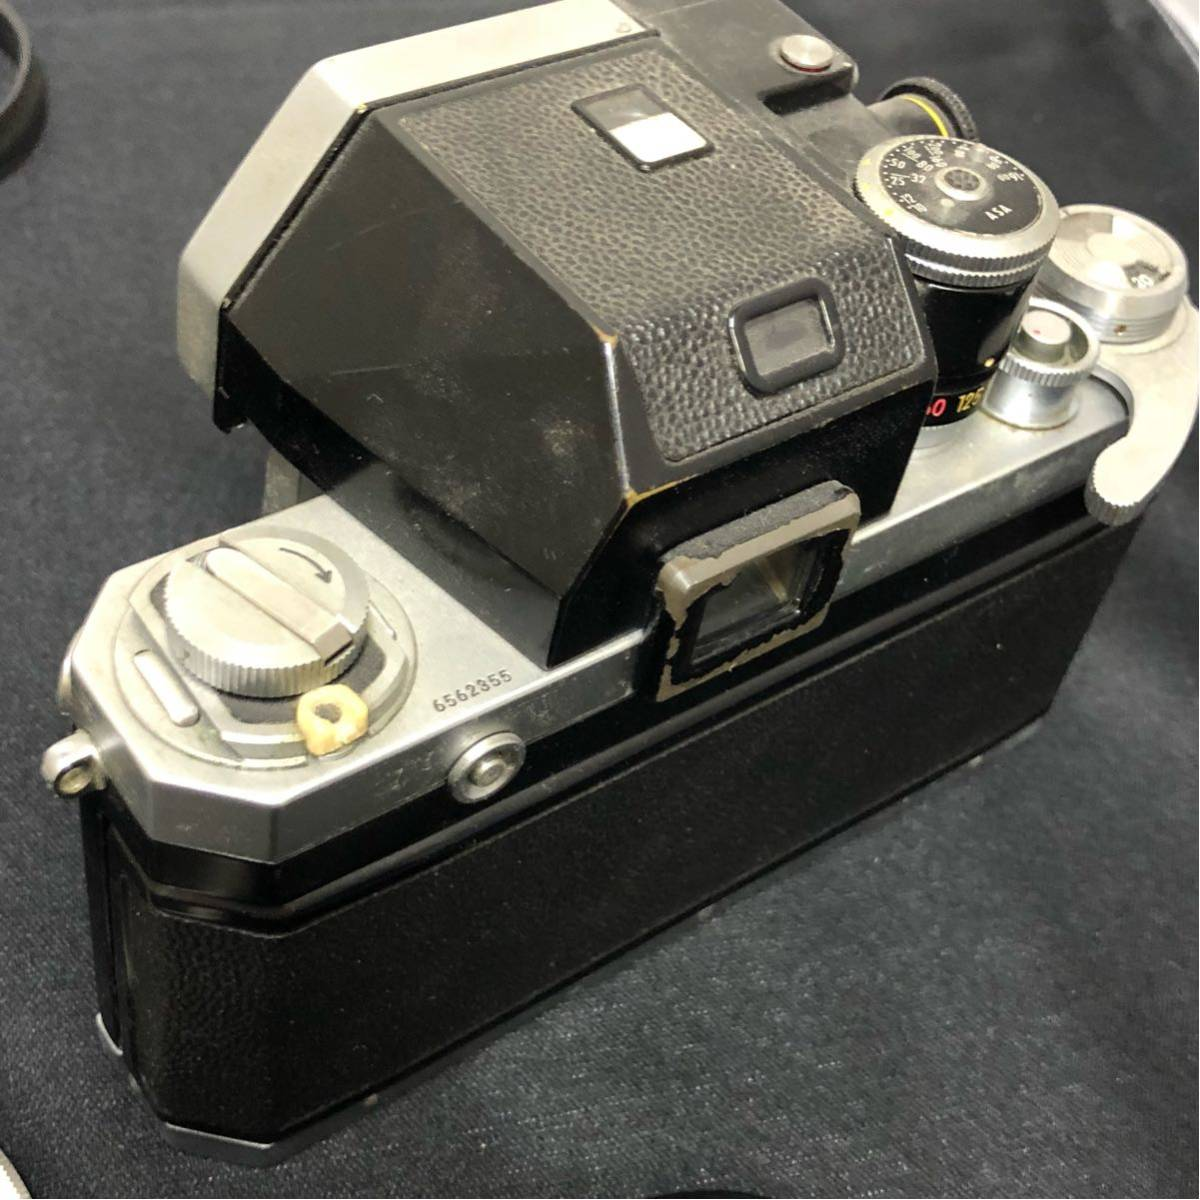 ♯ NIKON ニコン 一眼レフ カメラ F nikkor-ud 1:3.5 20mm nikkor 50mm 1:1.2 レンズ2本セット_画像6